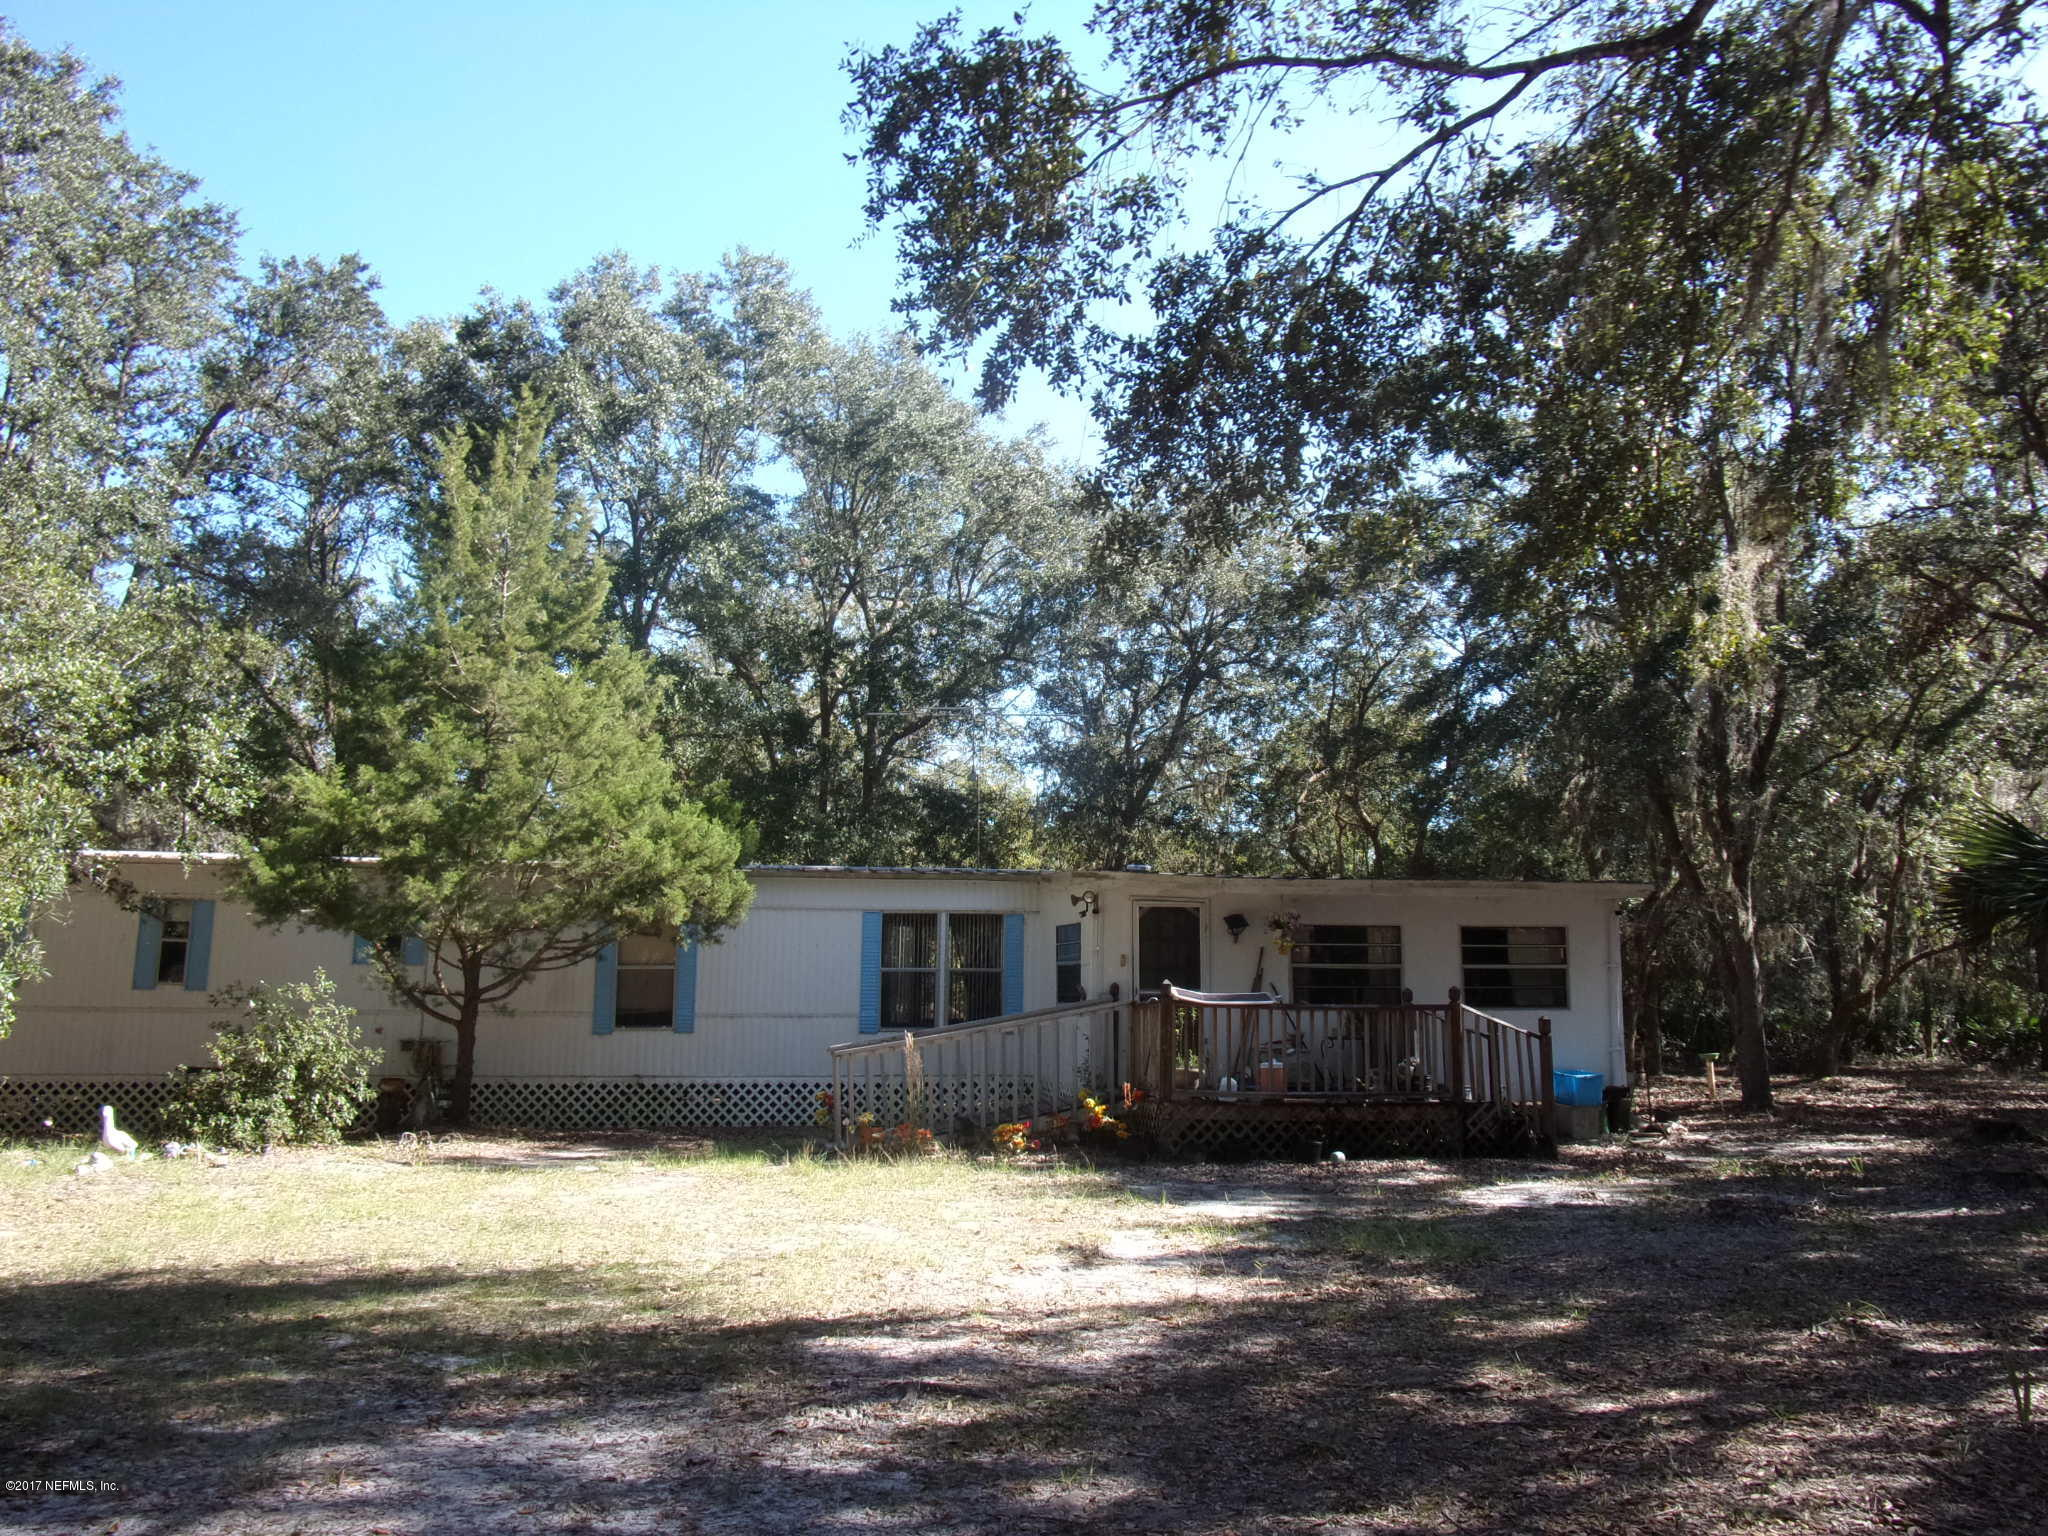 150 ROSE WALK, GEORGETOWN, FLORIDA 32139, 2 Bedrooms Bedrooms, ,1 BathroomBathrooms,Residential - mobile home,For sale,ROSE WALK,909384